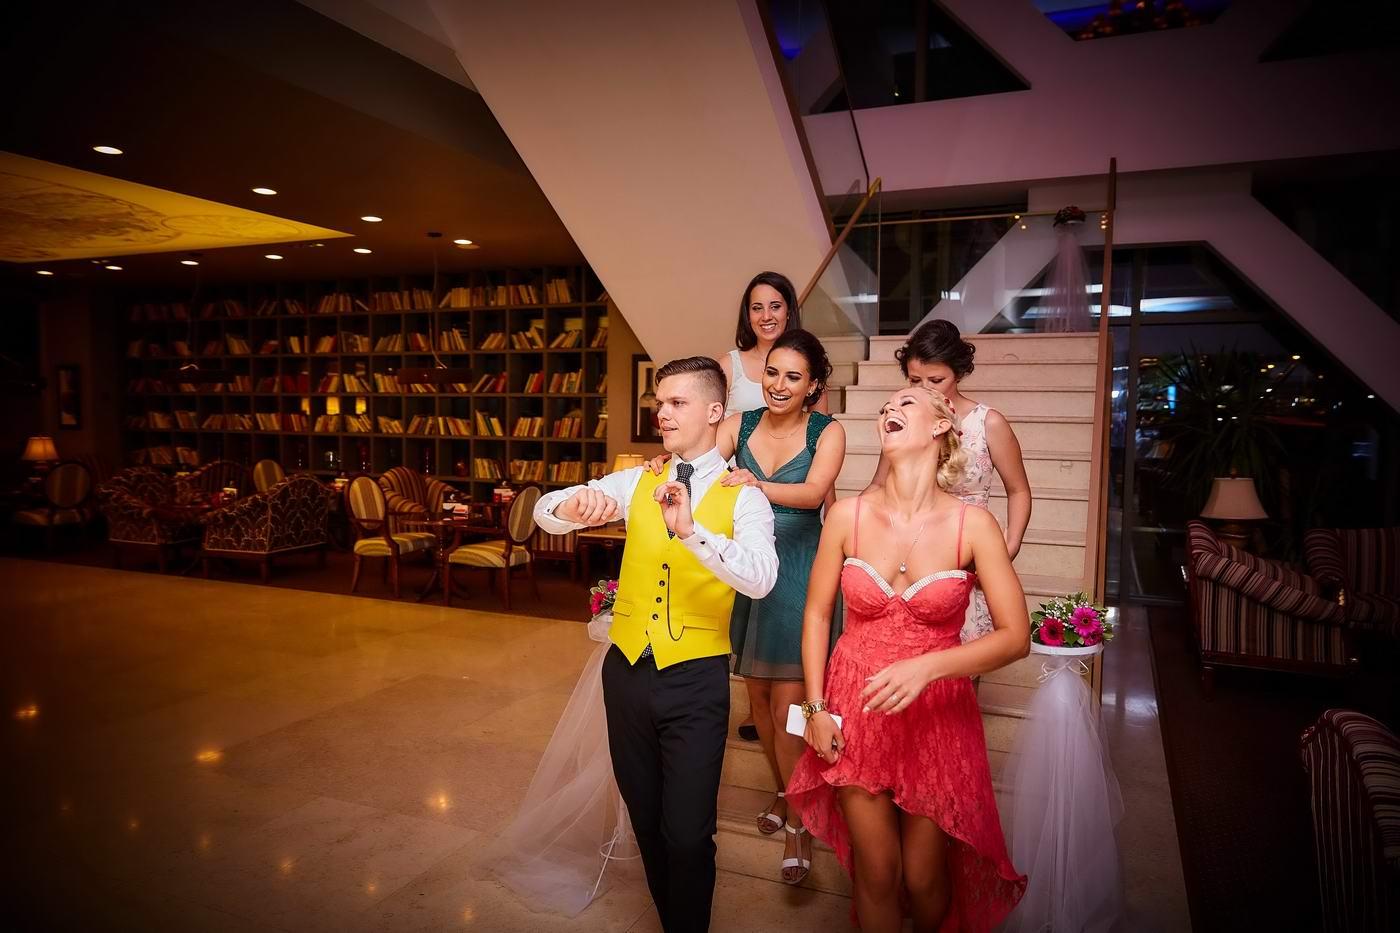 Wedding Day Photos Brasov (125)